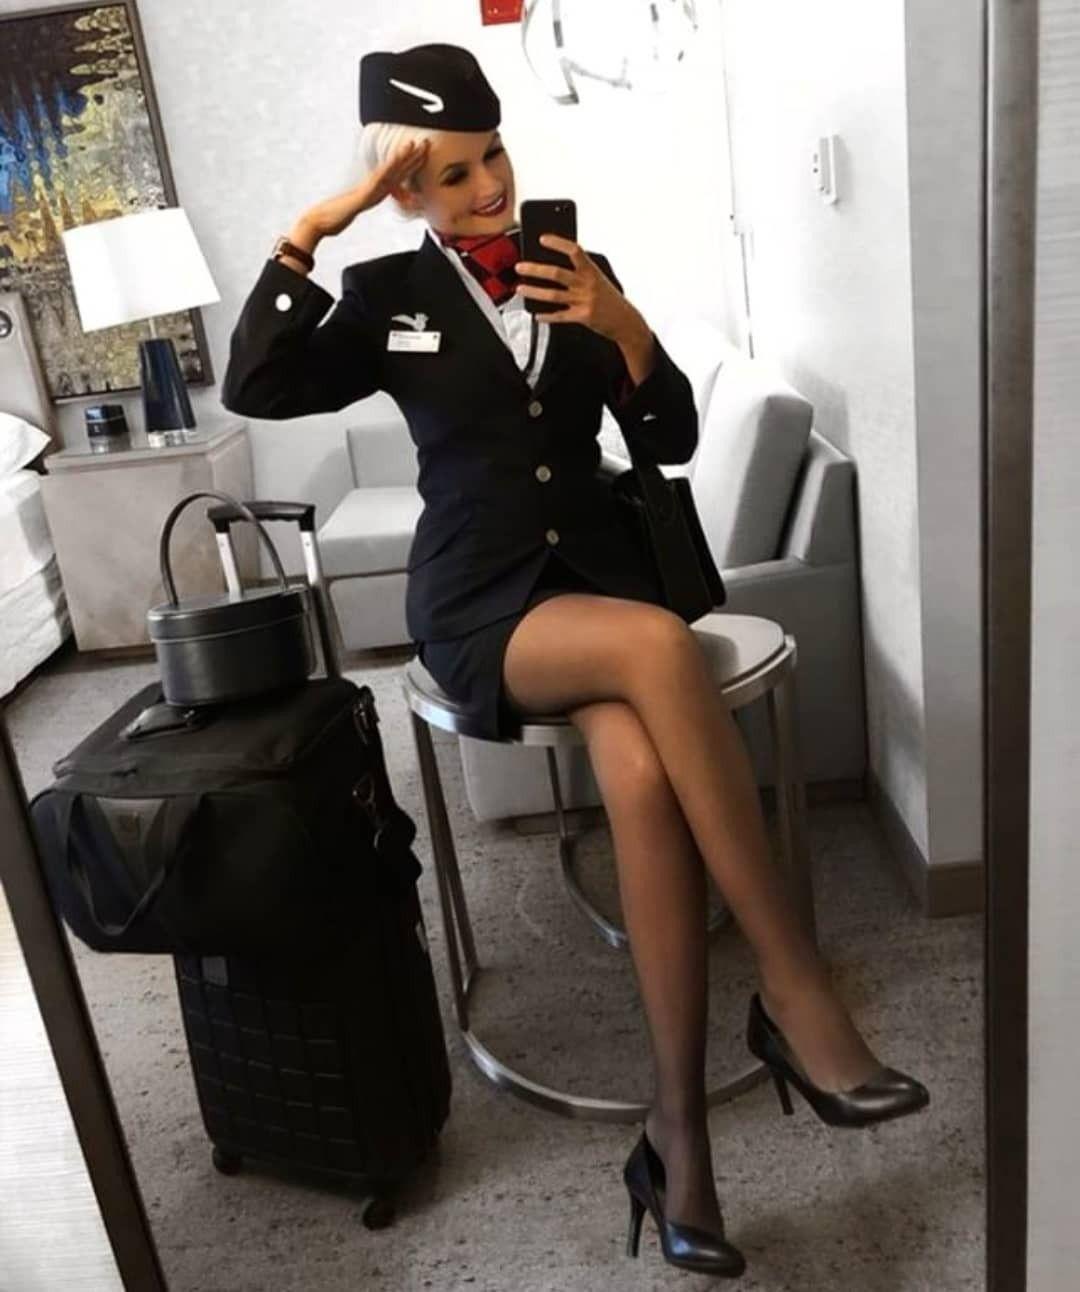 трахает стюардэссу пассажир